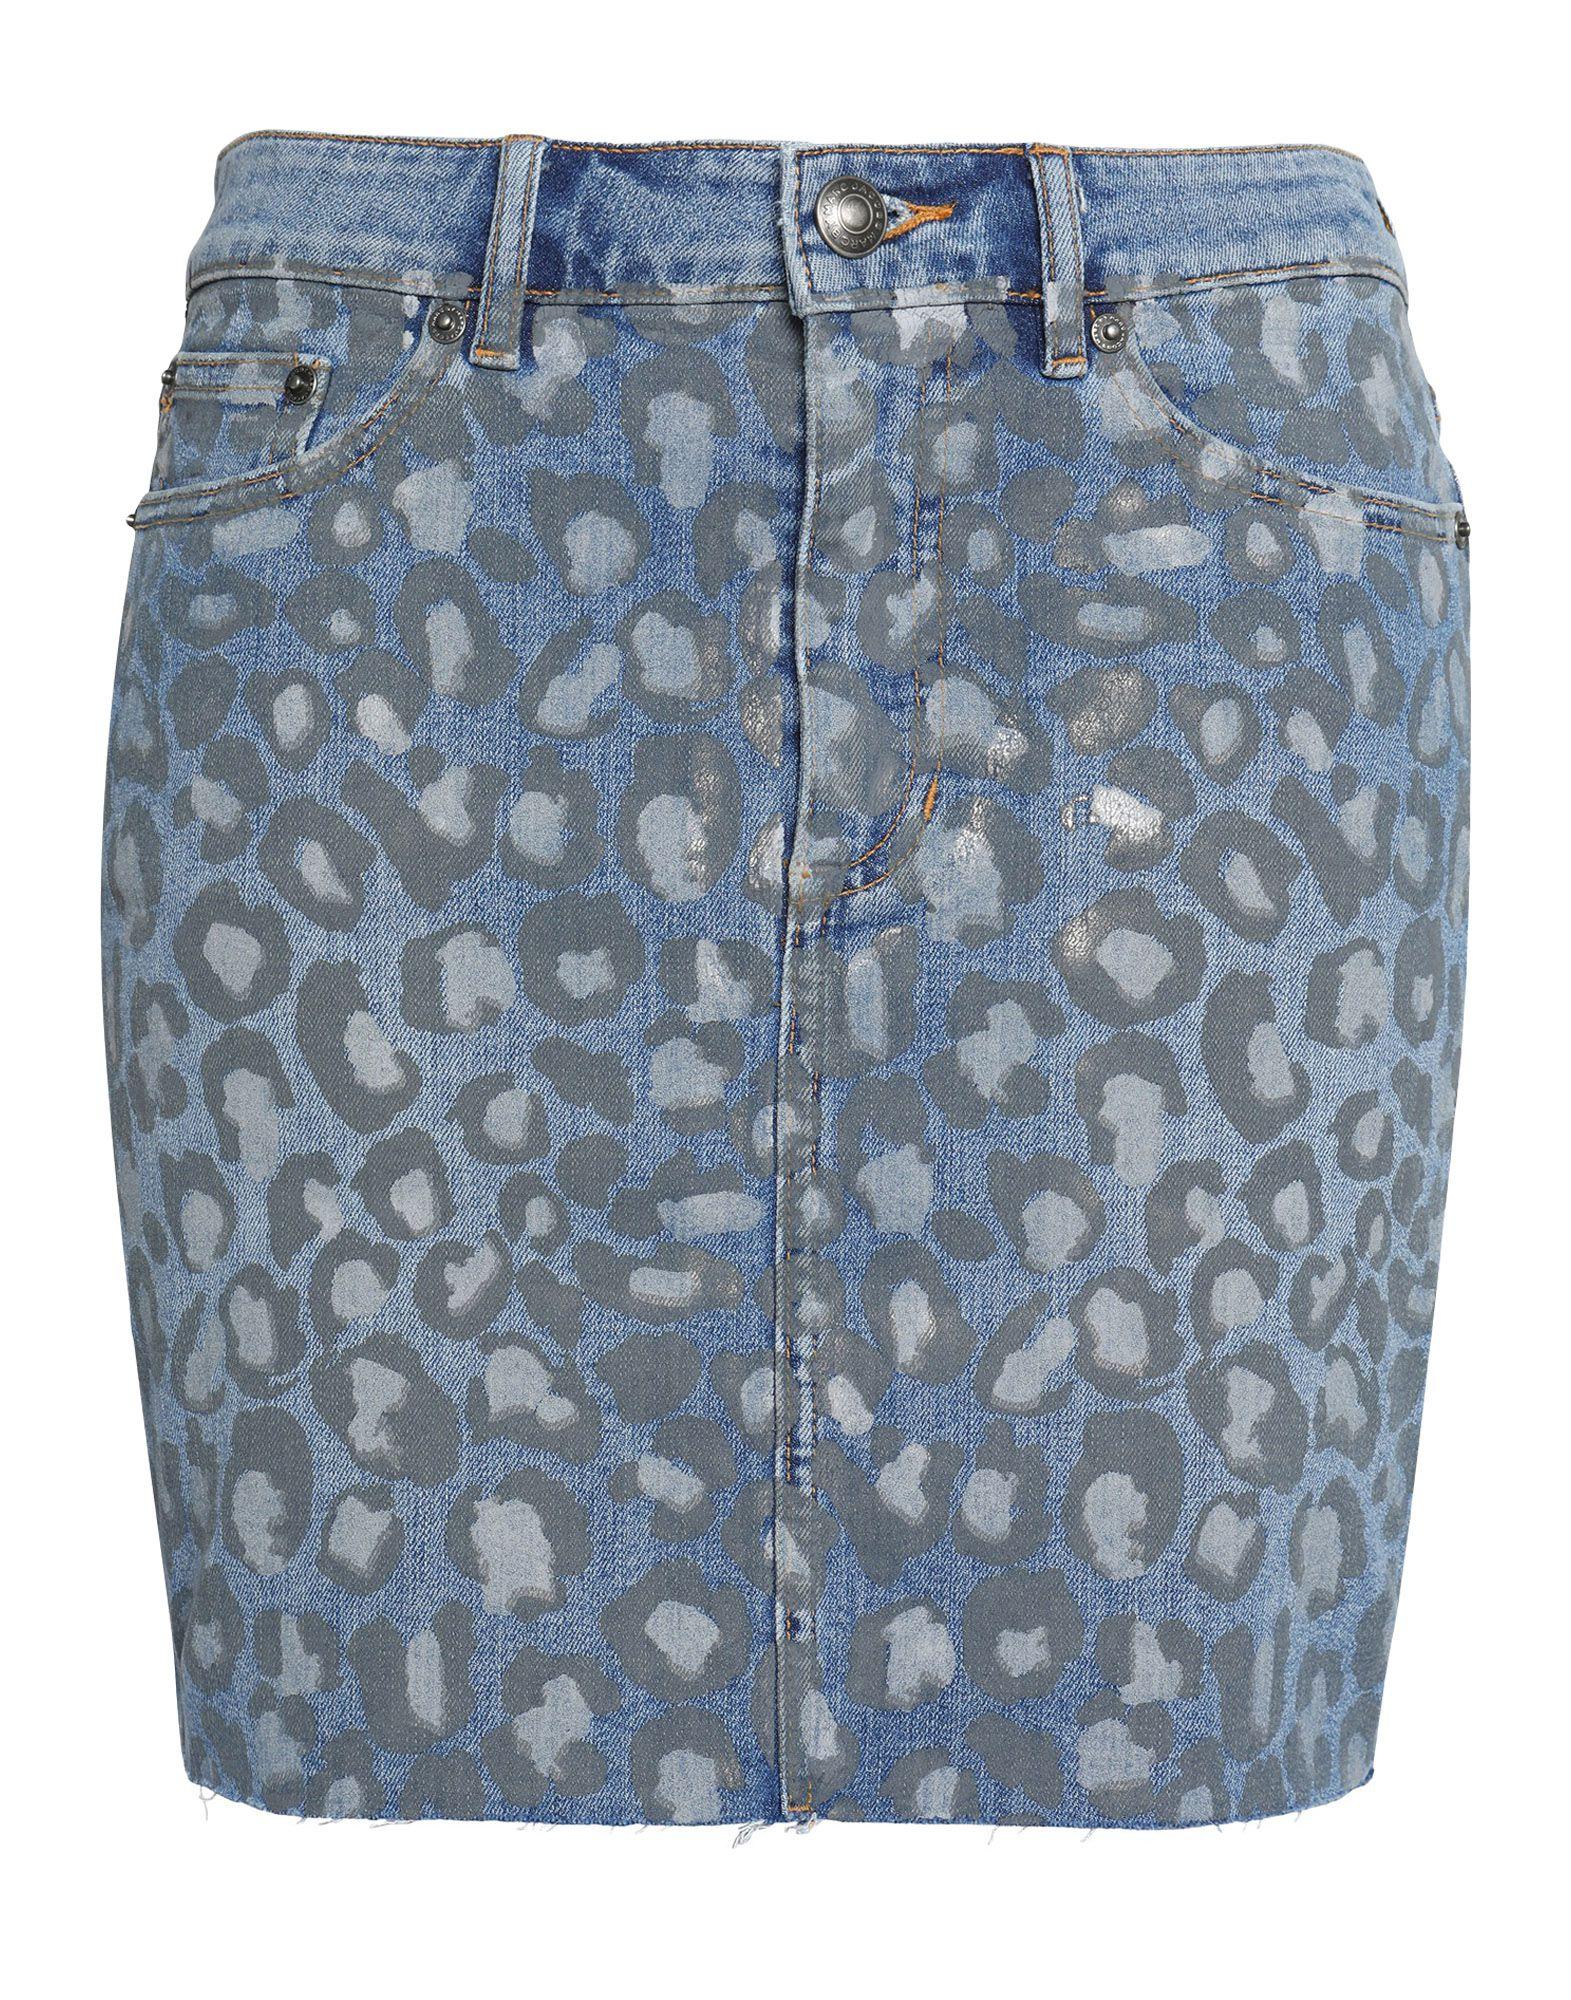 MARC BY MARC JACOBS Джинсовая юбка marc by marc jacobs джинсовая рубашка